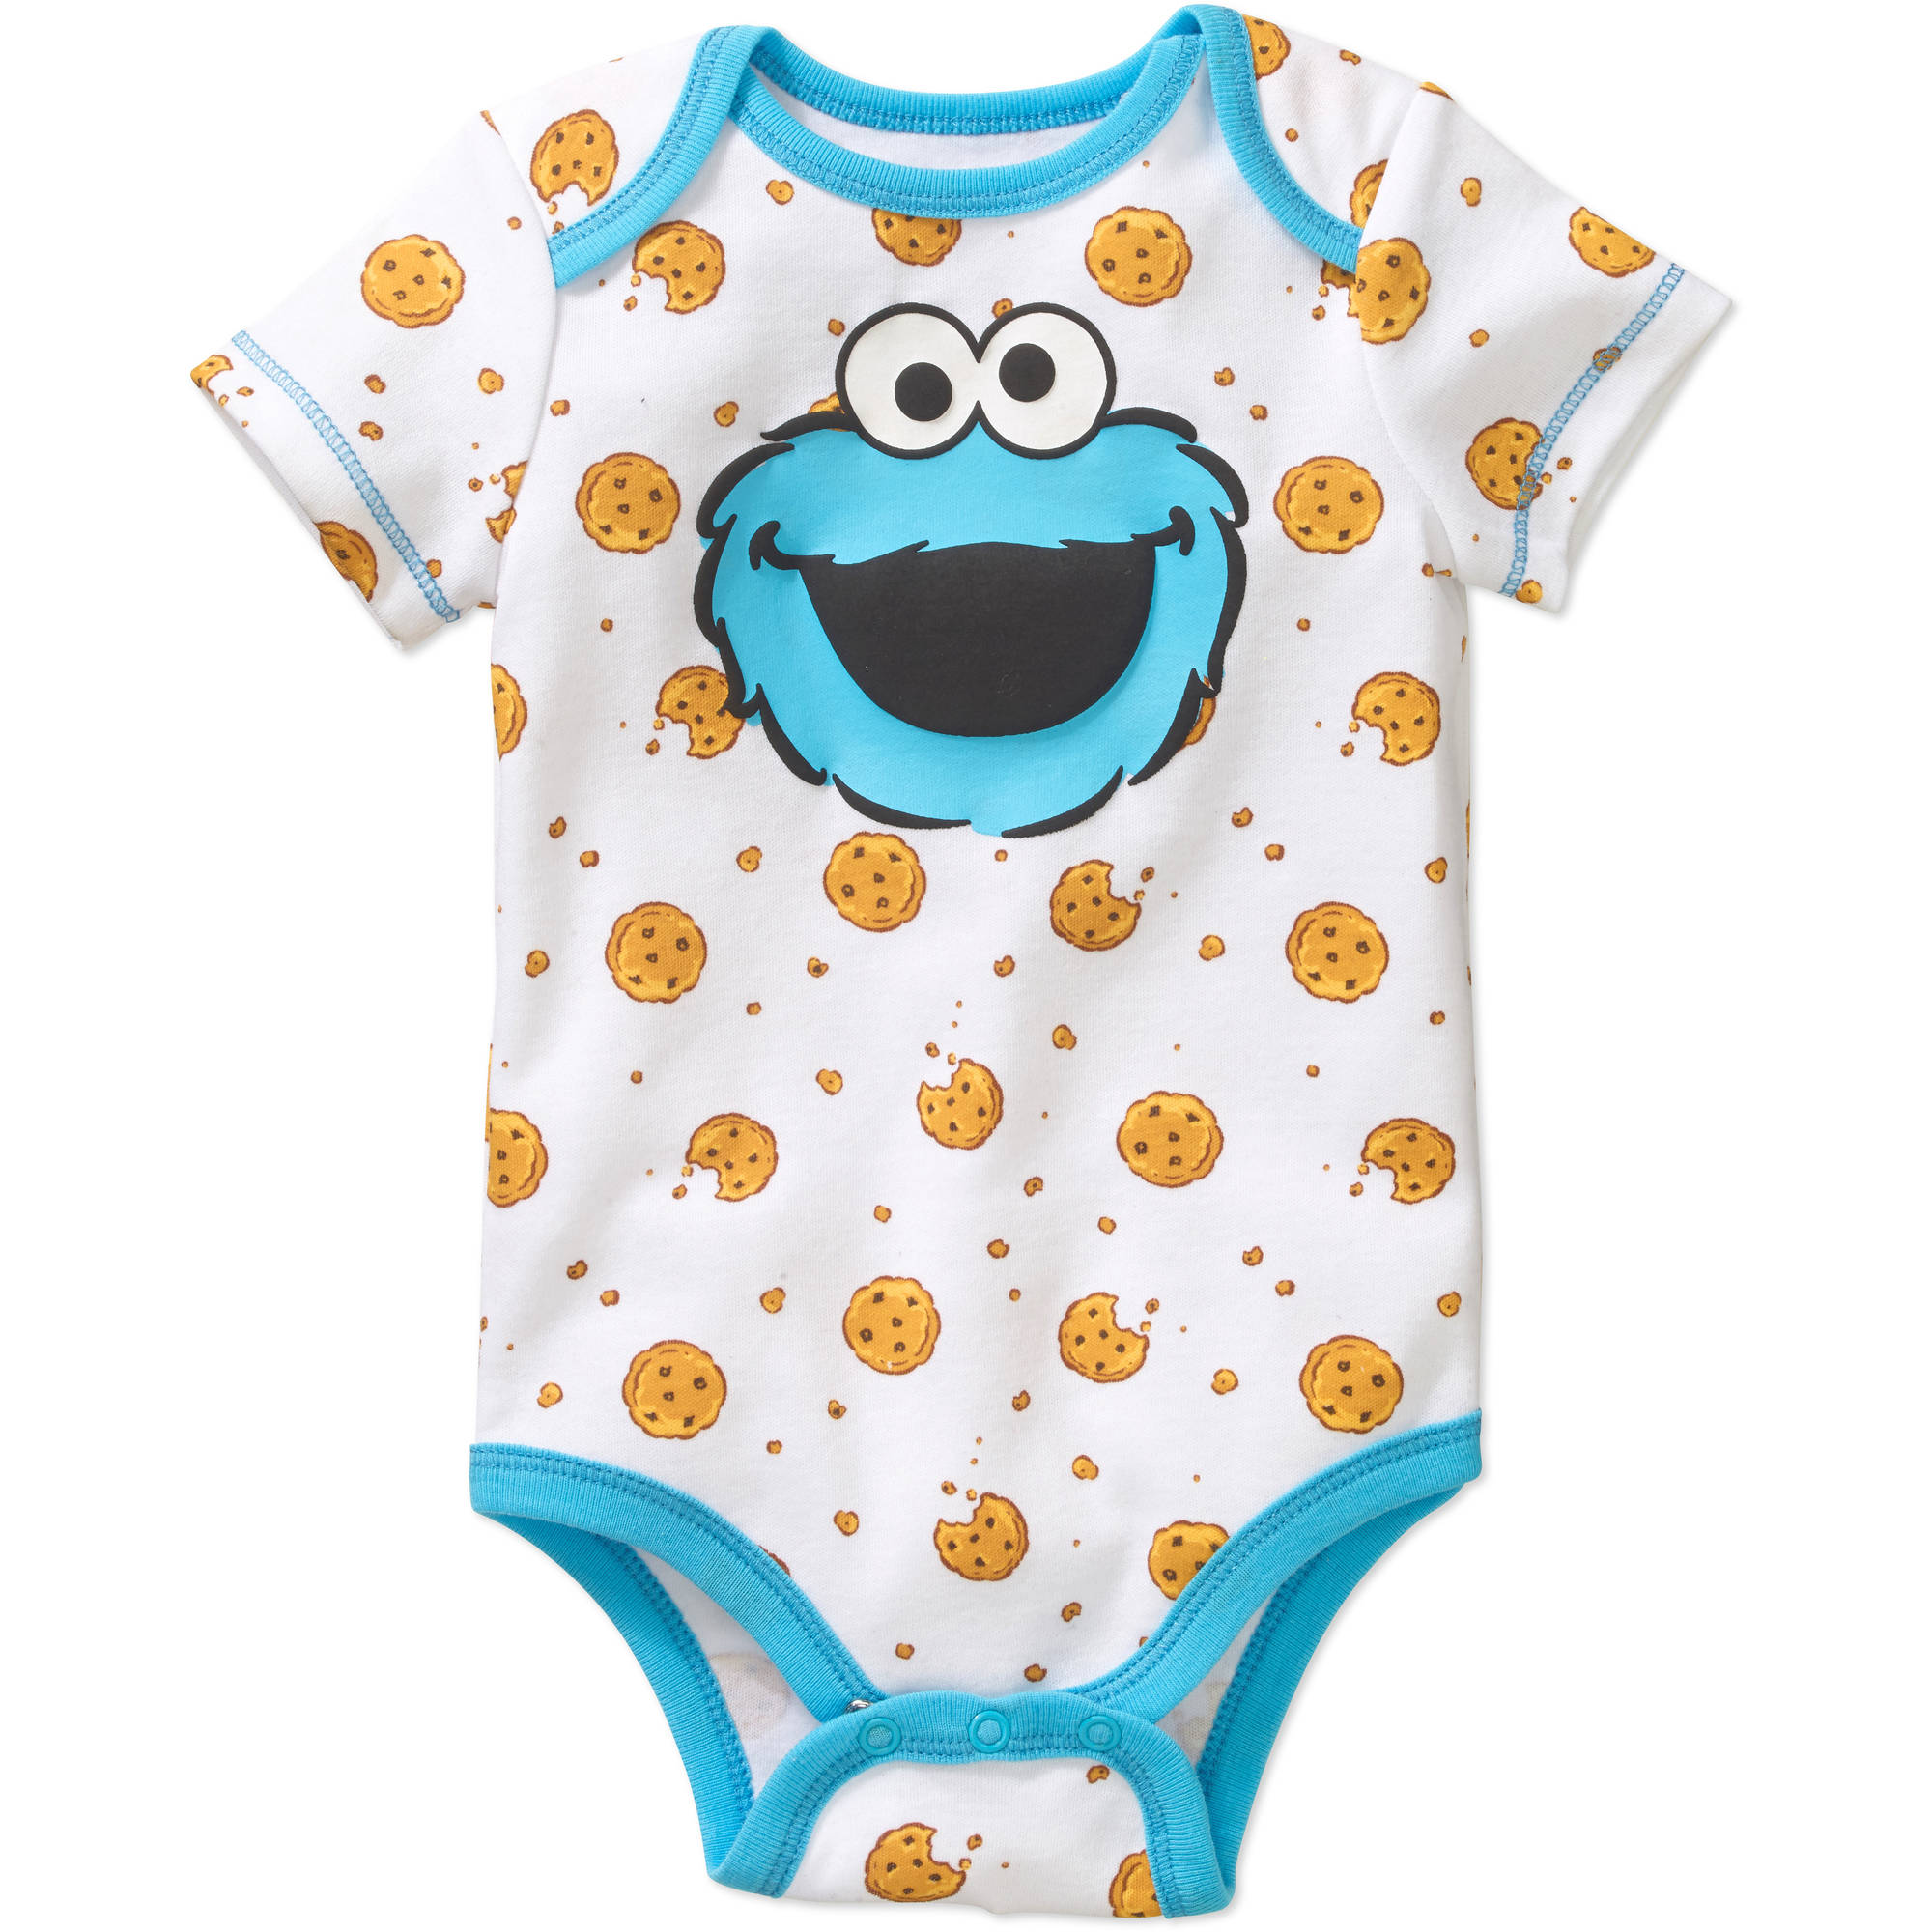 Generic Cookie Monster Newborn Baby Boys' Bodysuit